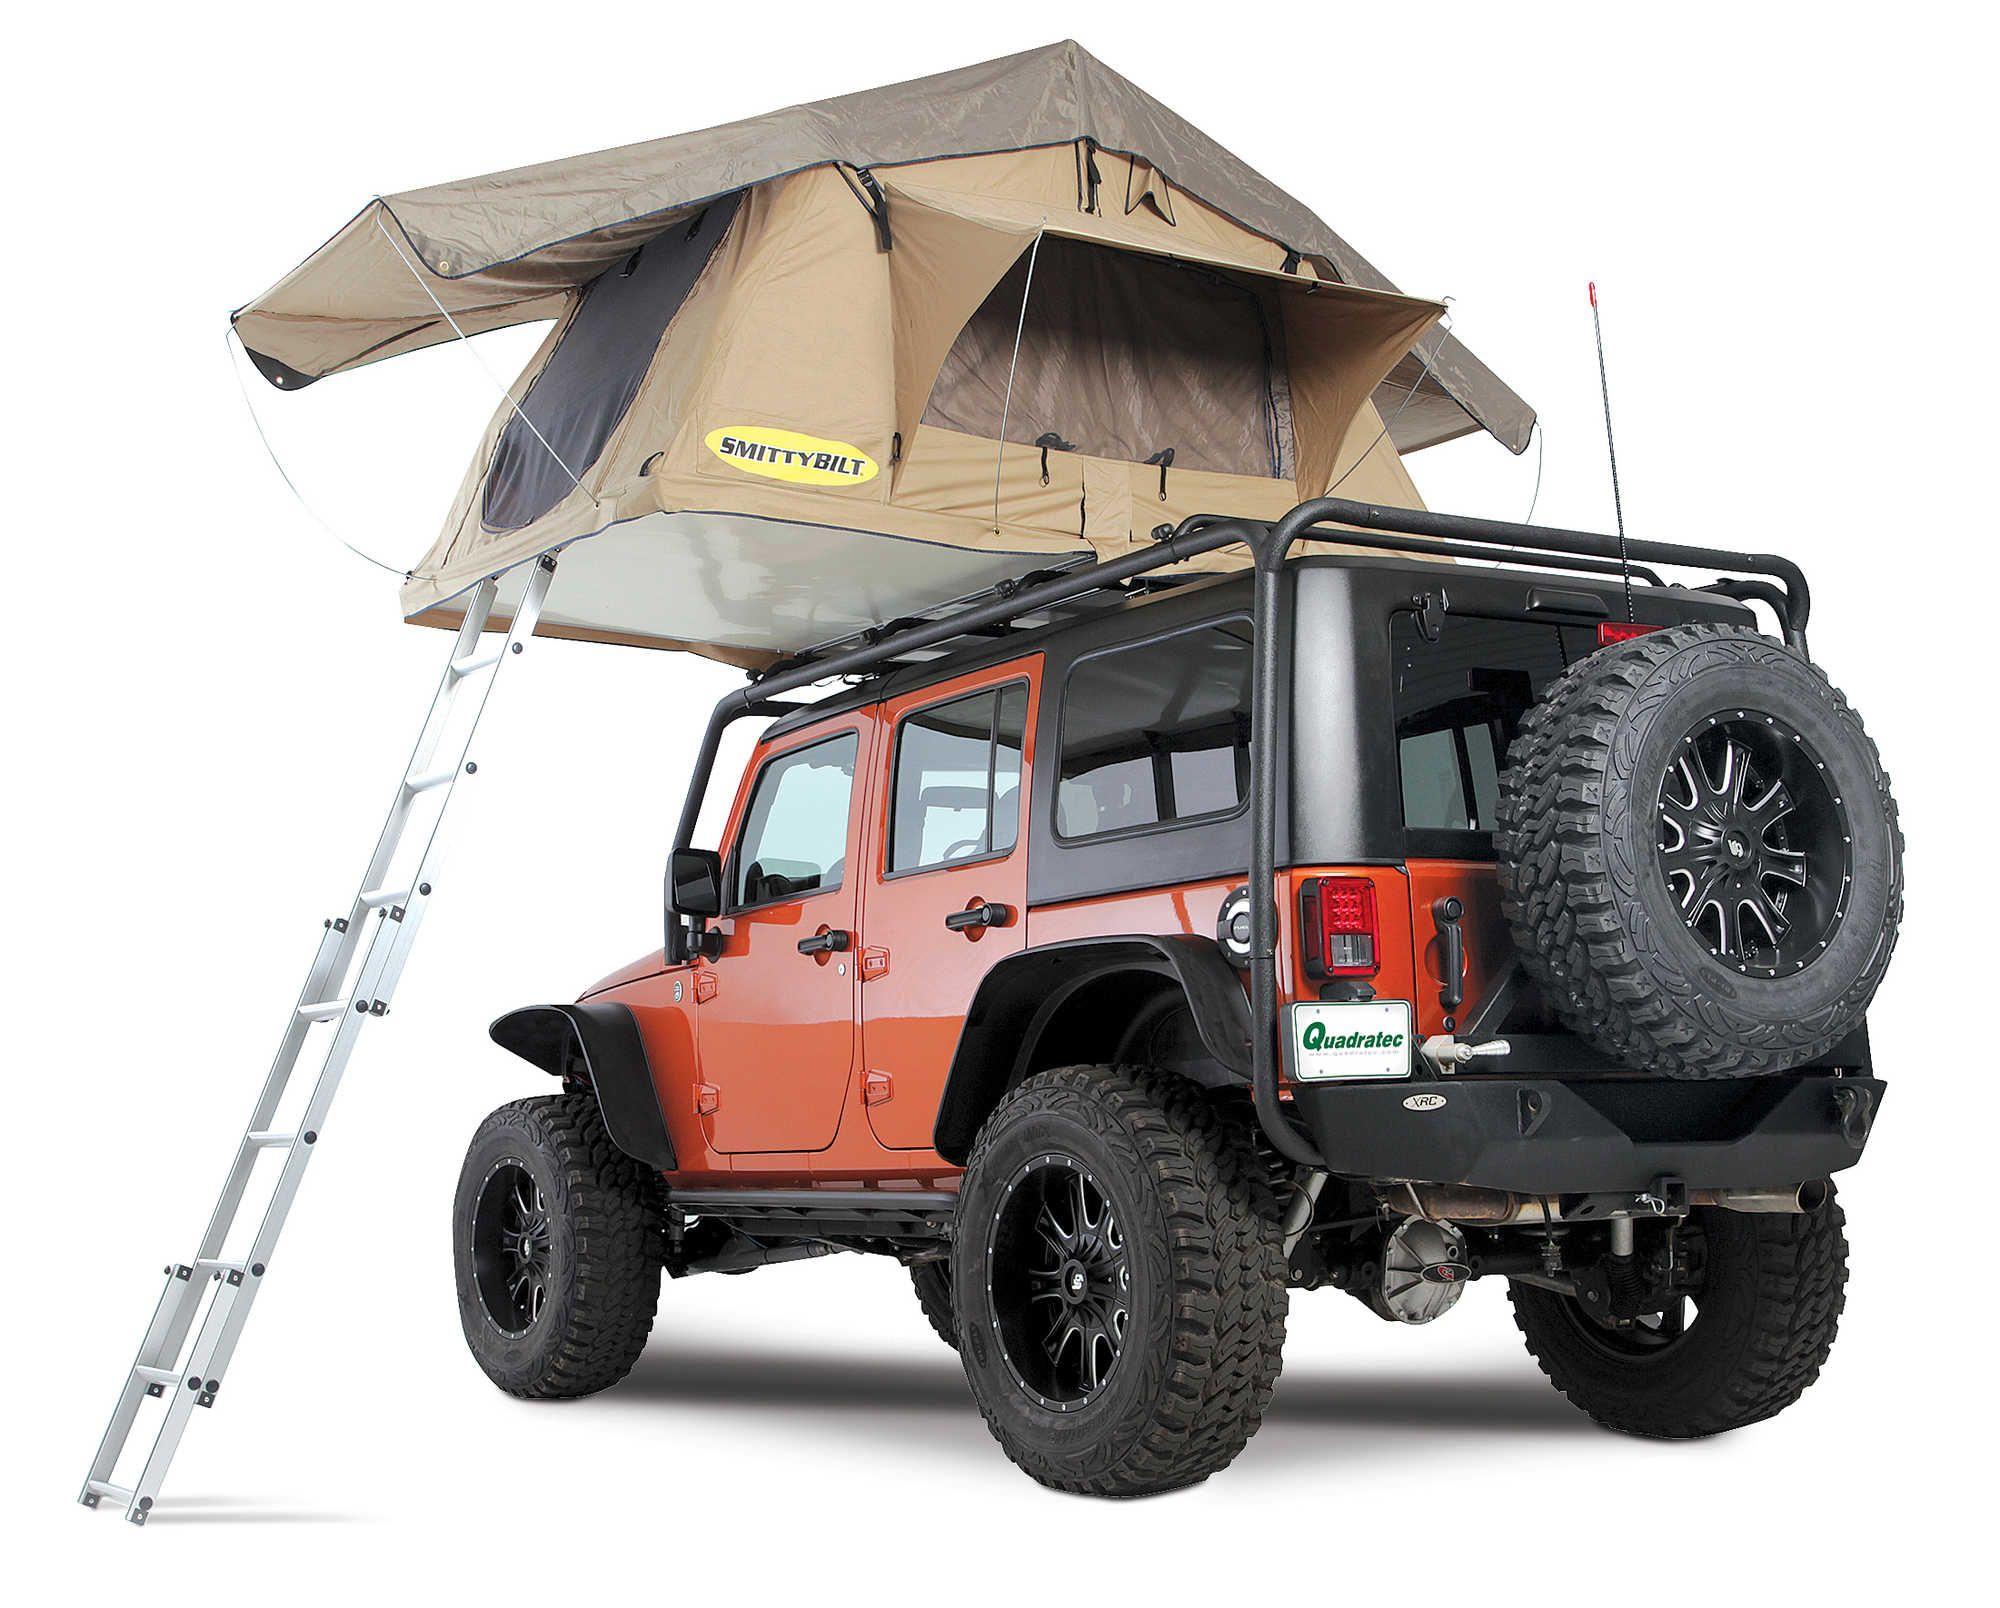 Smittybilt 2783 Overlander Tent Jeep Tent Roof Top Tent Jeep